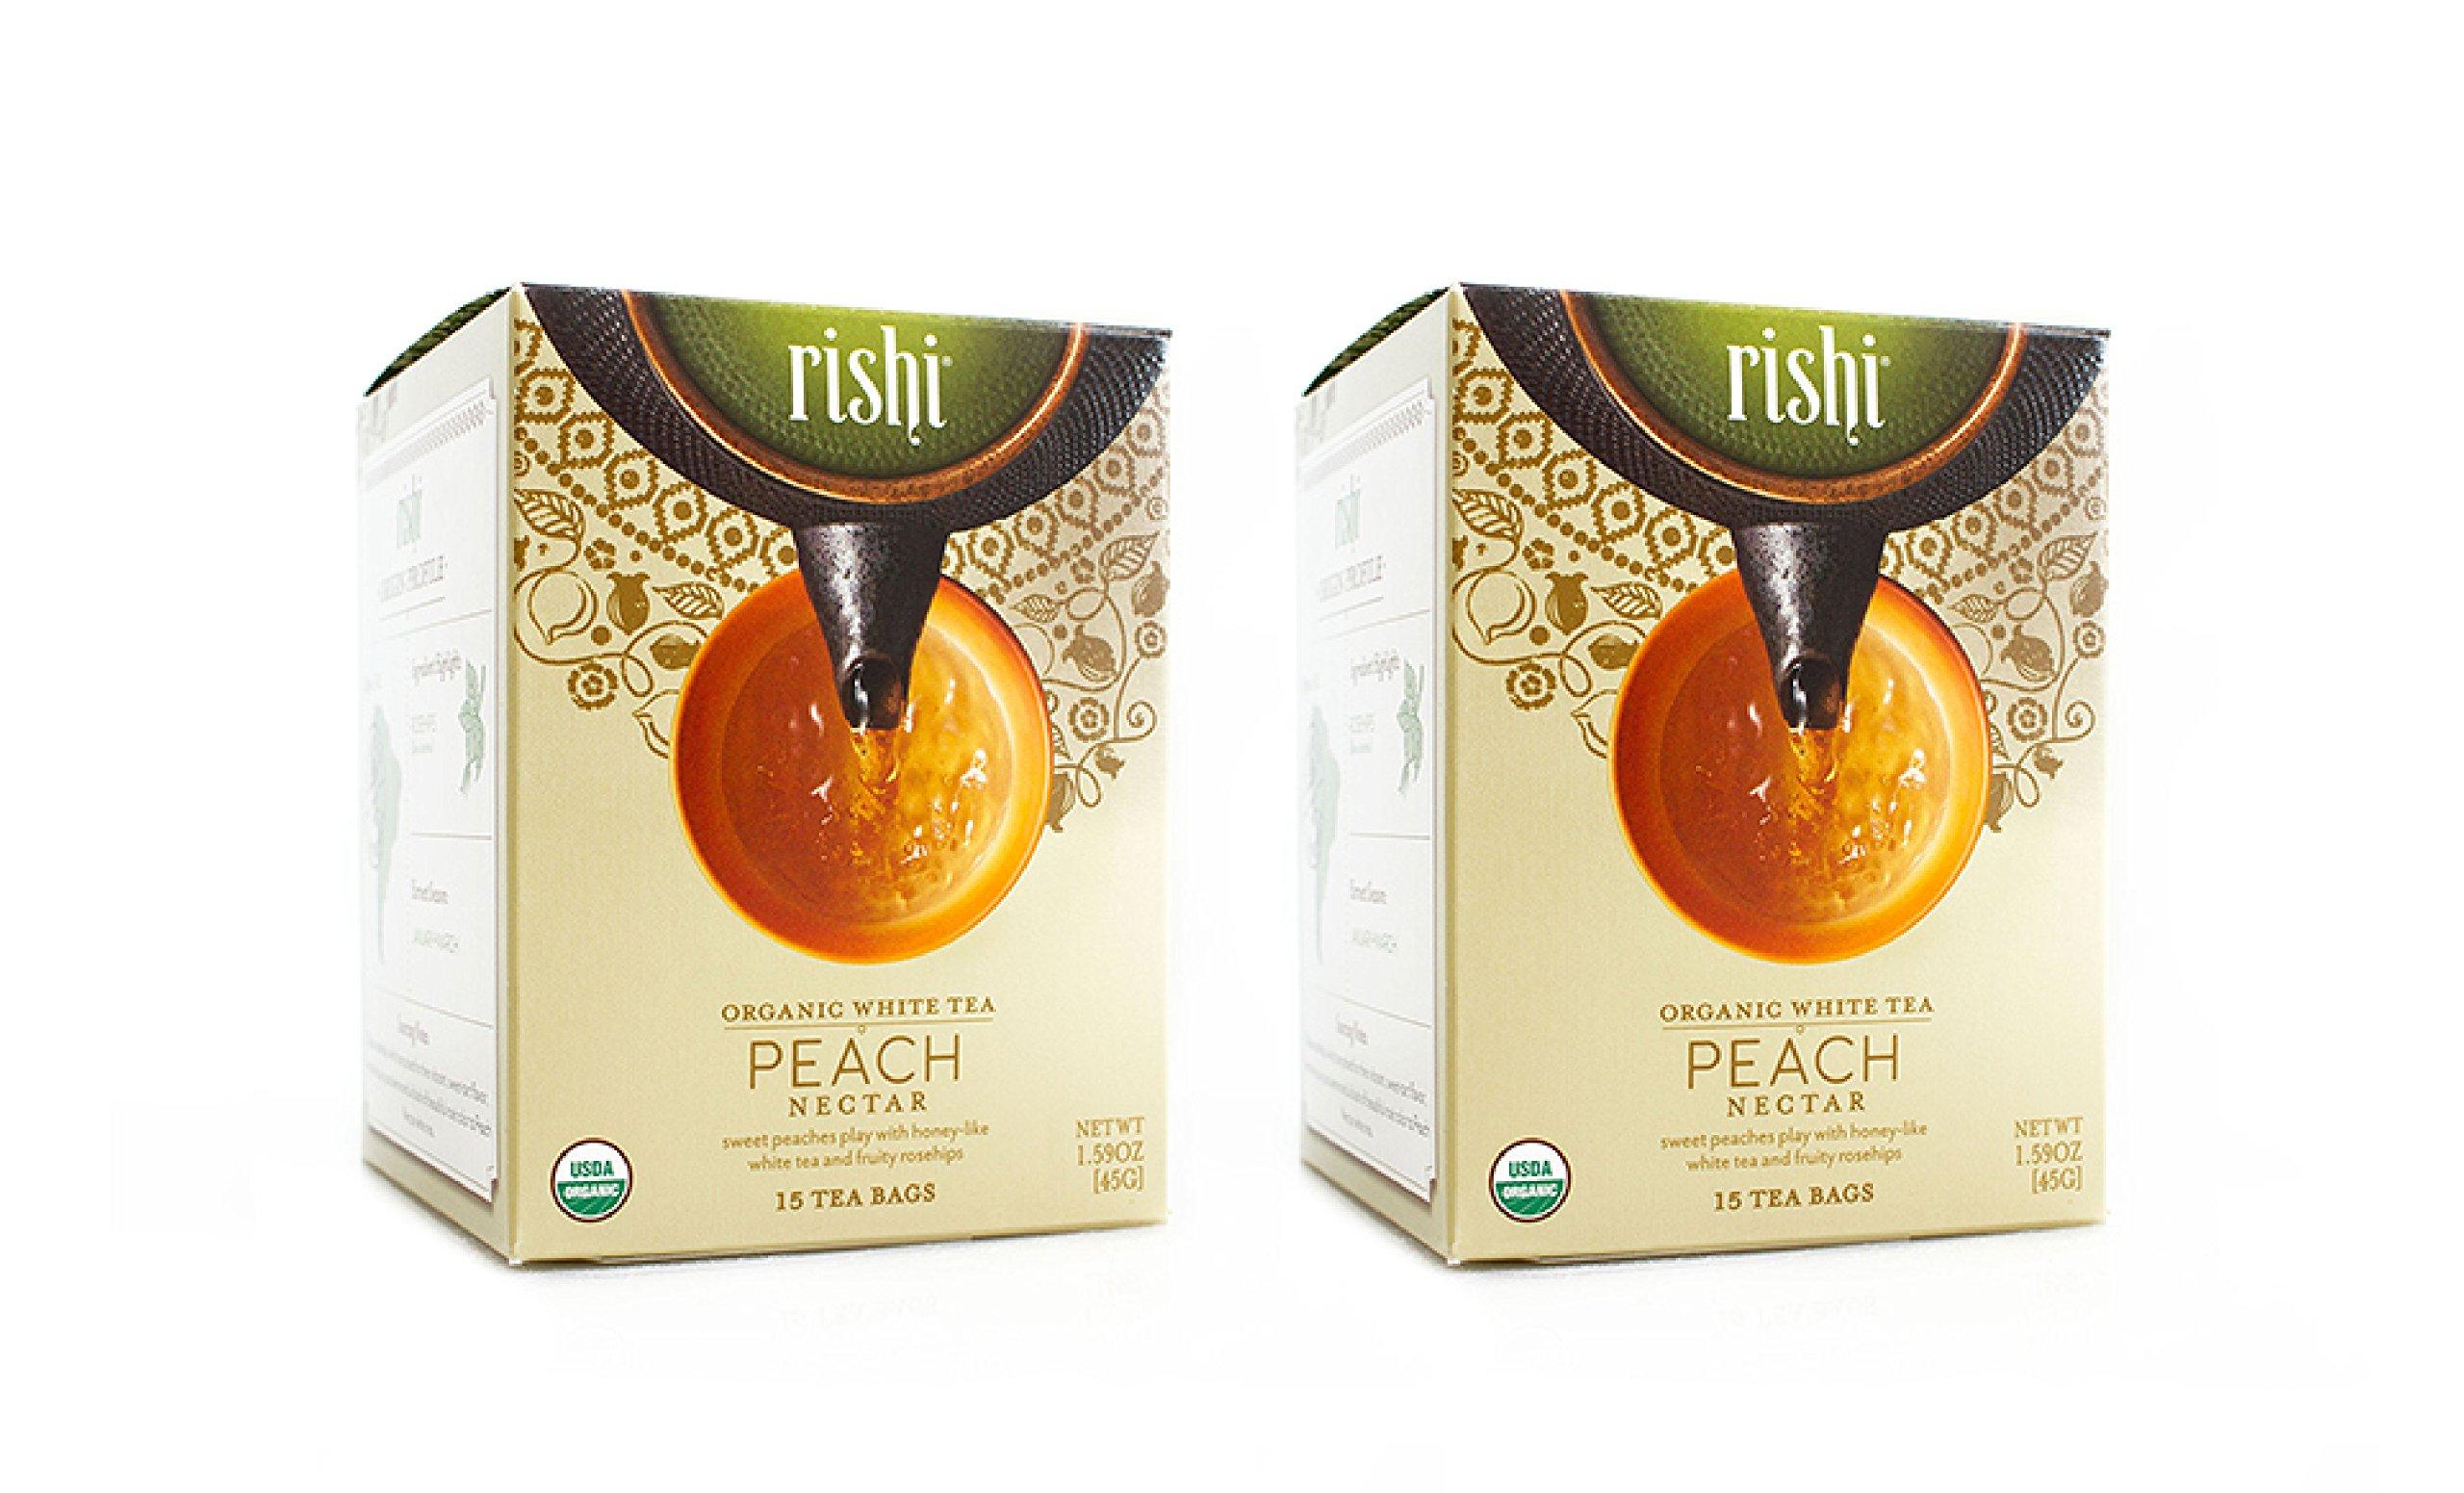 Rishi Peach Nectar Tea, Organic White Tea Sachet Bags, 15 Count (Pack of 2)